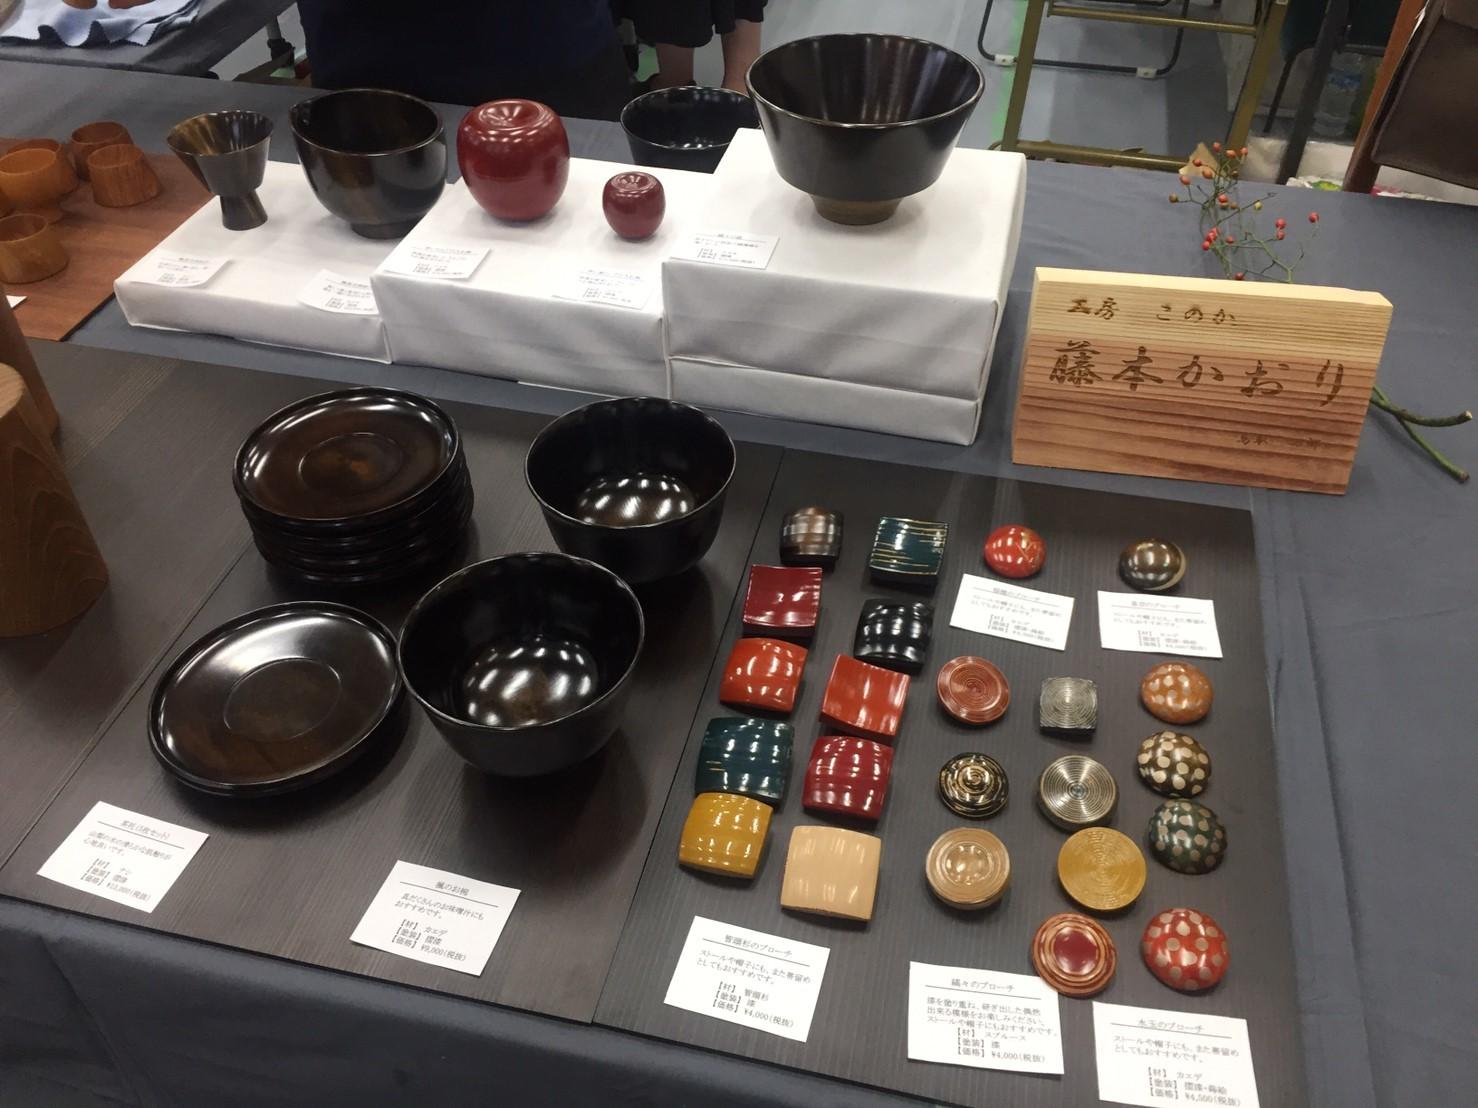 西郷工芸祭り・三滝渓_e0115904_16163664.jpg